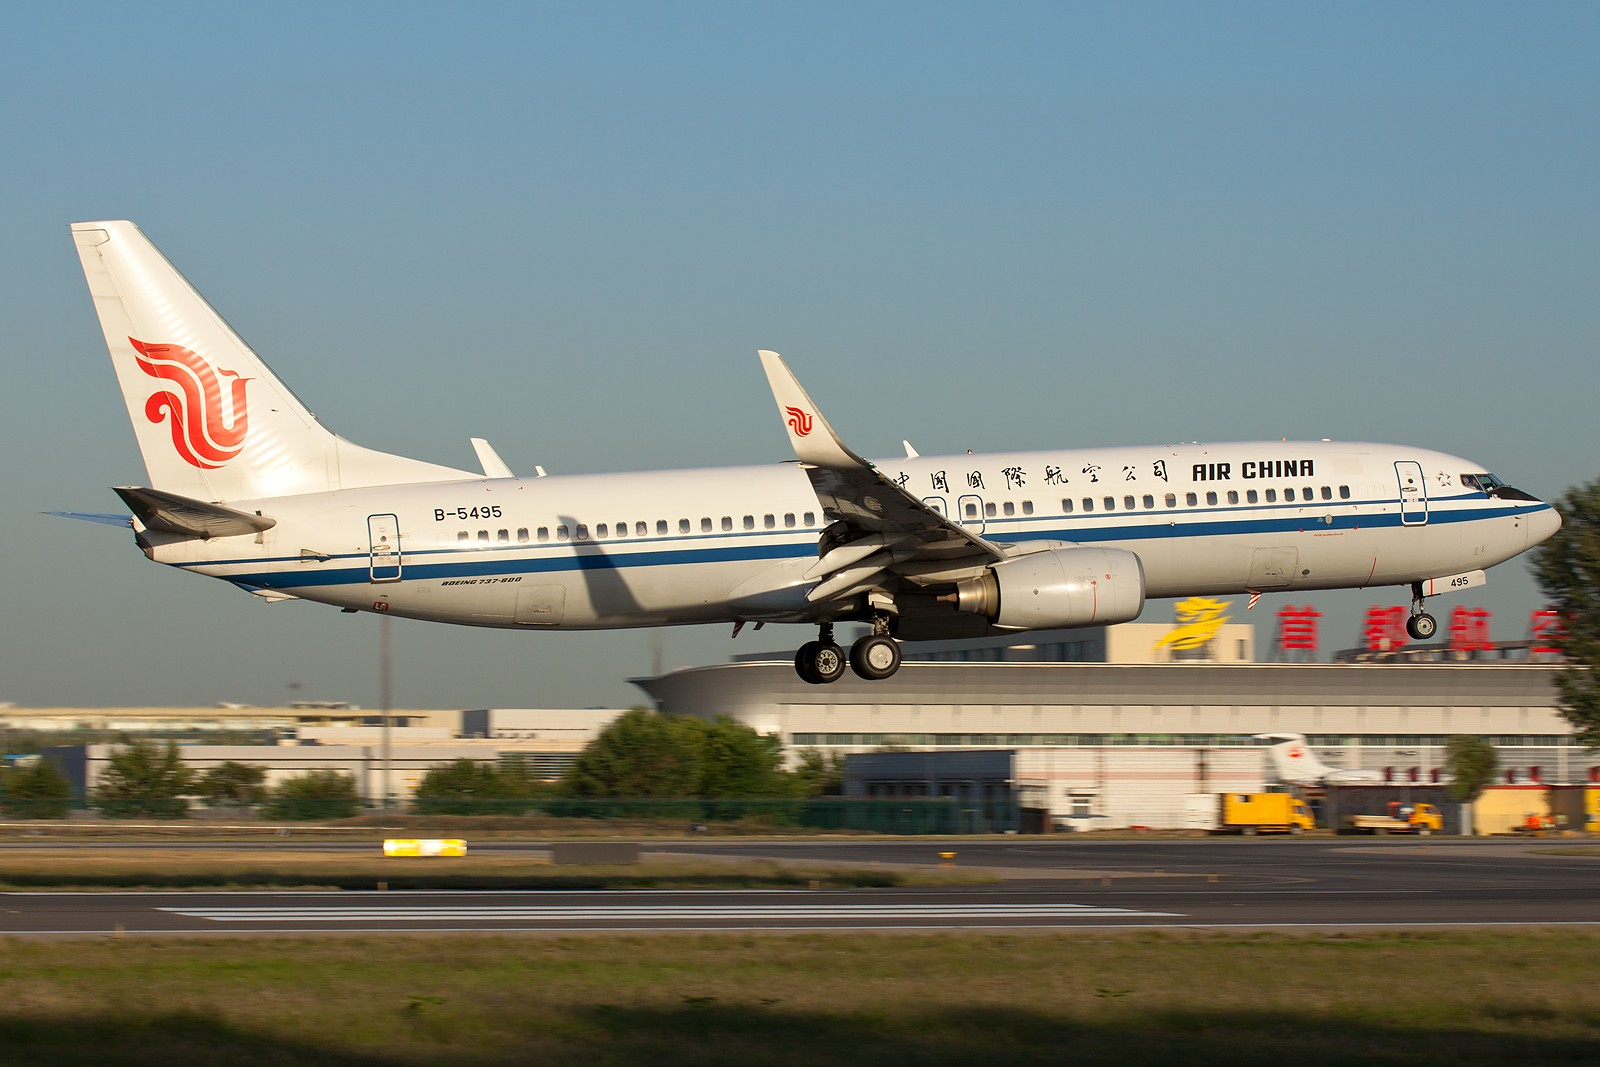 Re:[原创]国航一组 B737&A320系列 [10pics] BOEING 737-800 B-5495 中国北京首都机场